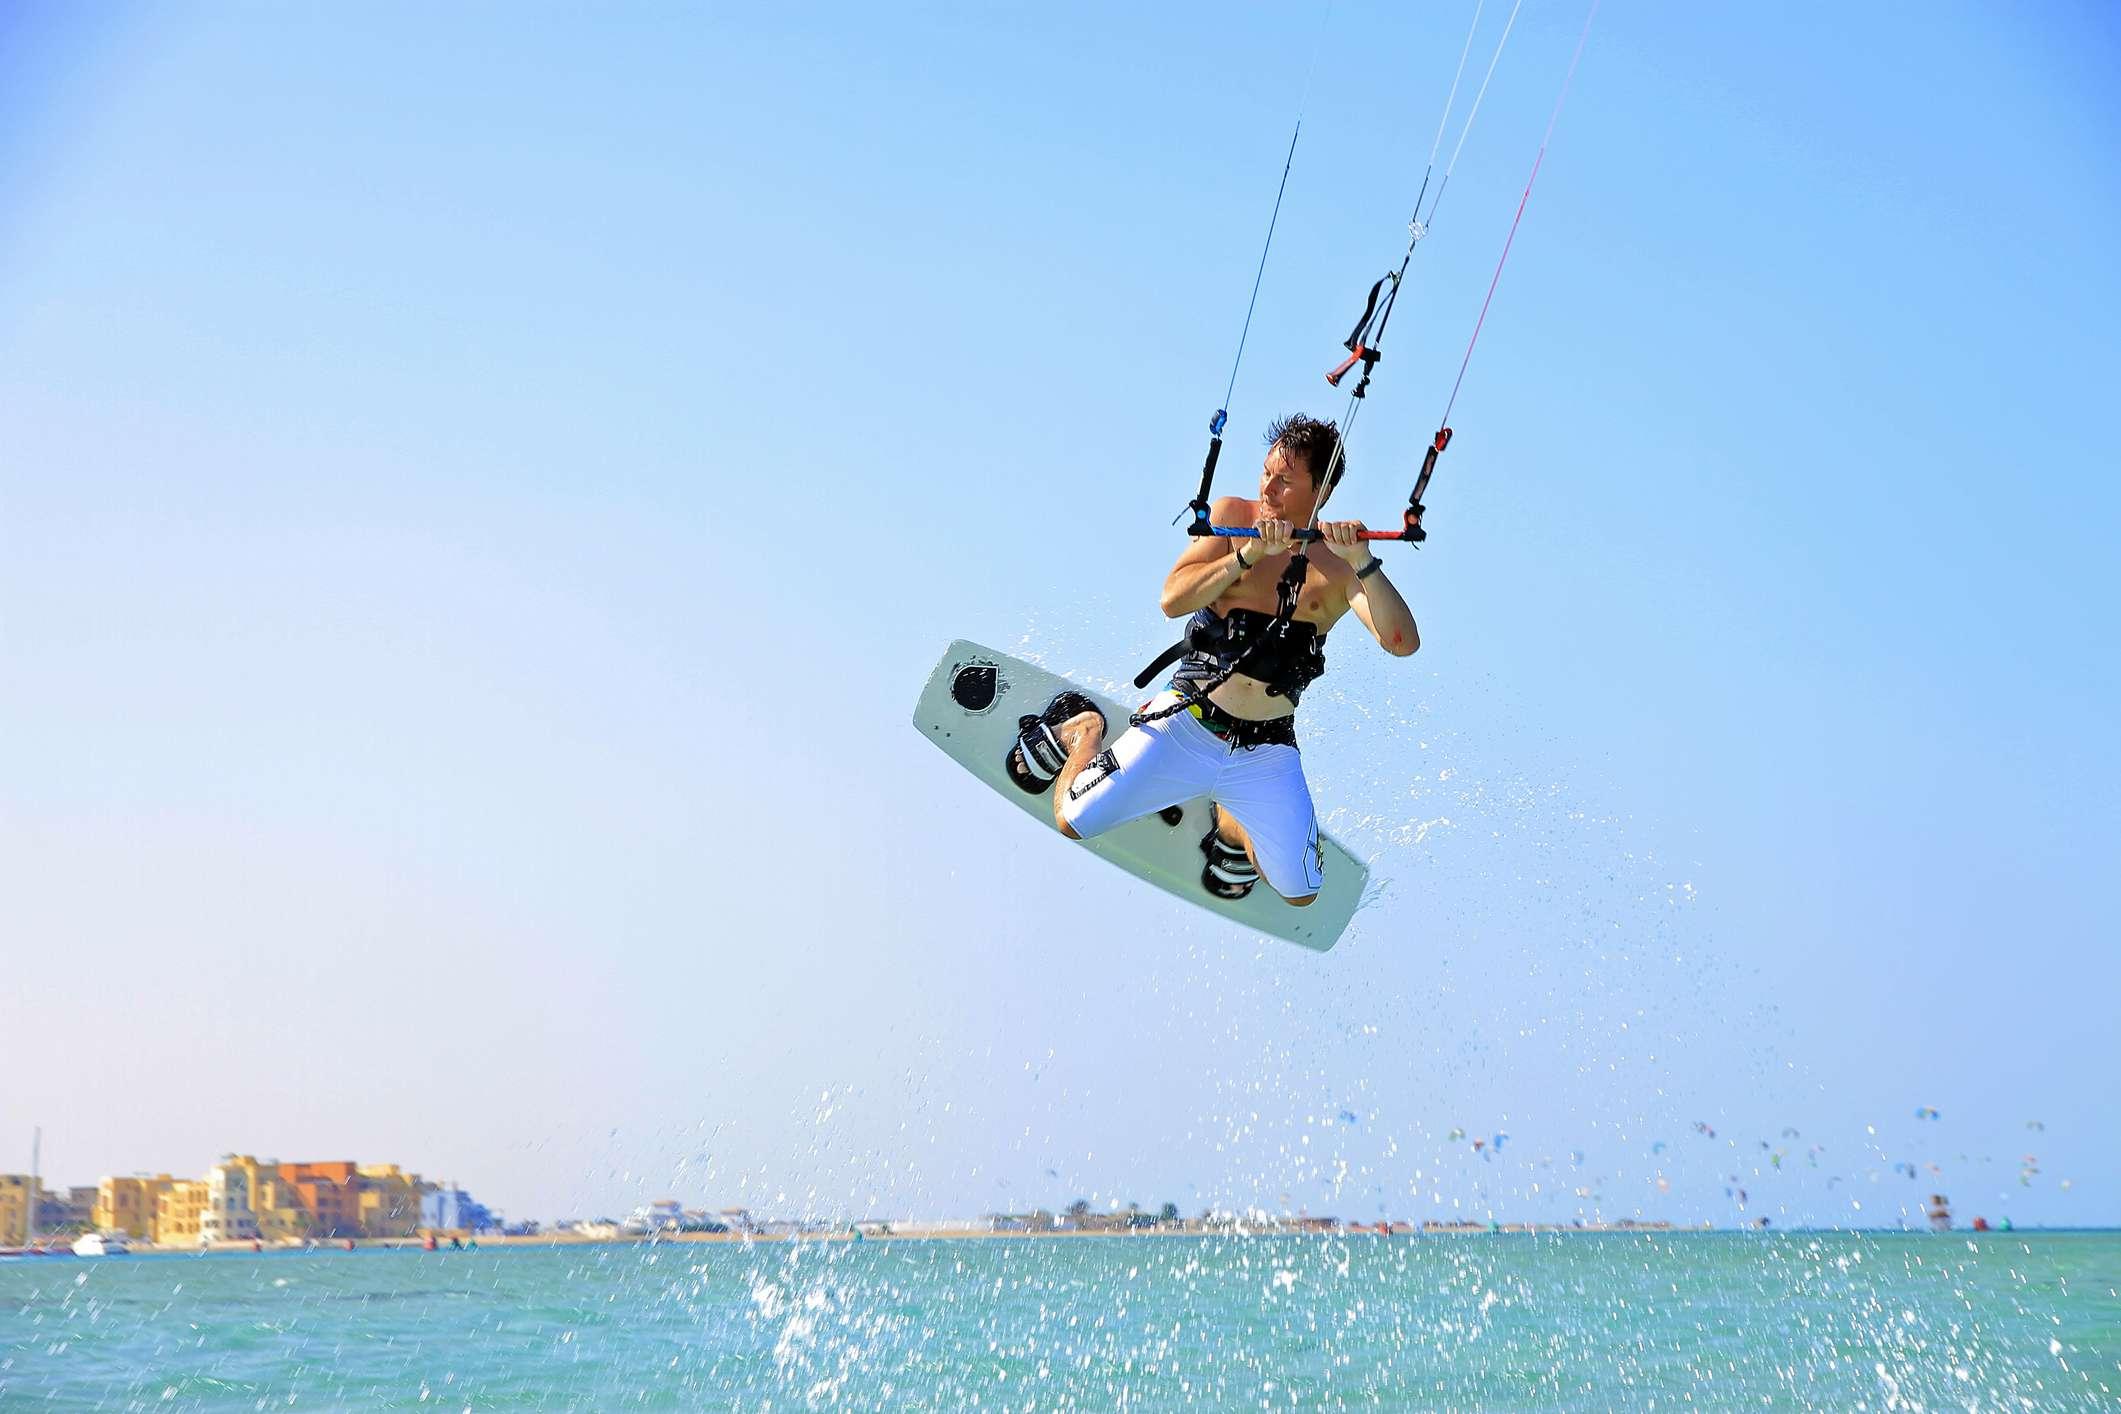 Kite-surfer at El Gouna, Egypt